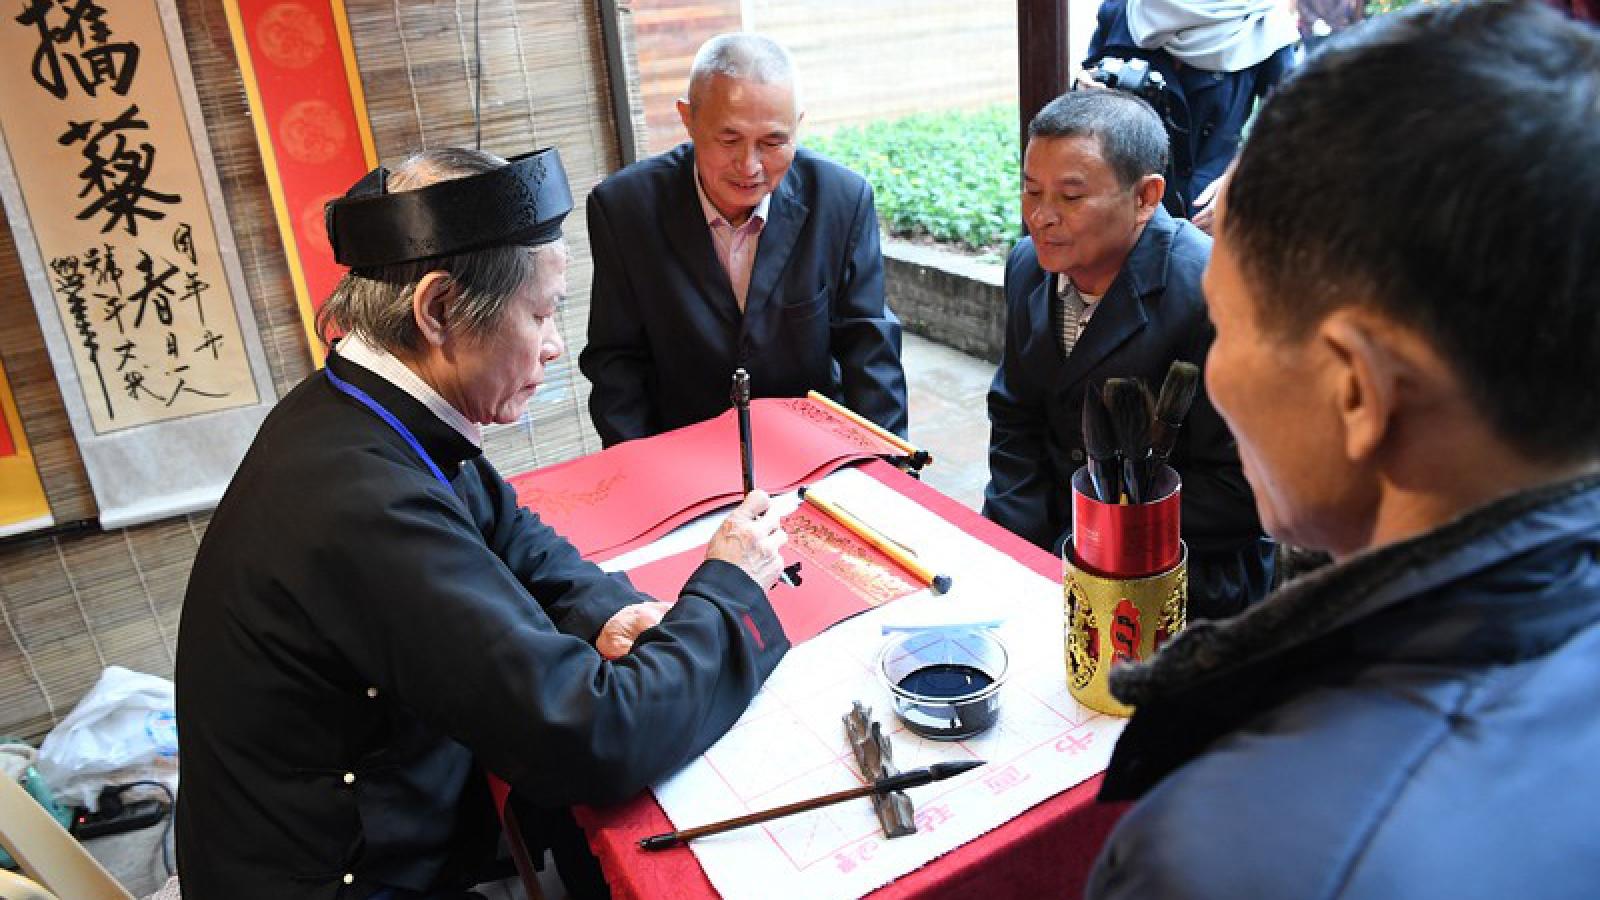 Calligraphy exhibition to celebrate Hanoi capital's 1,010th anniversary